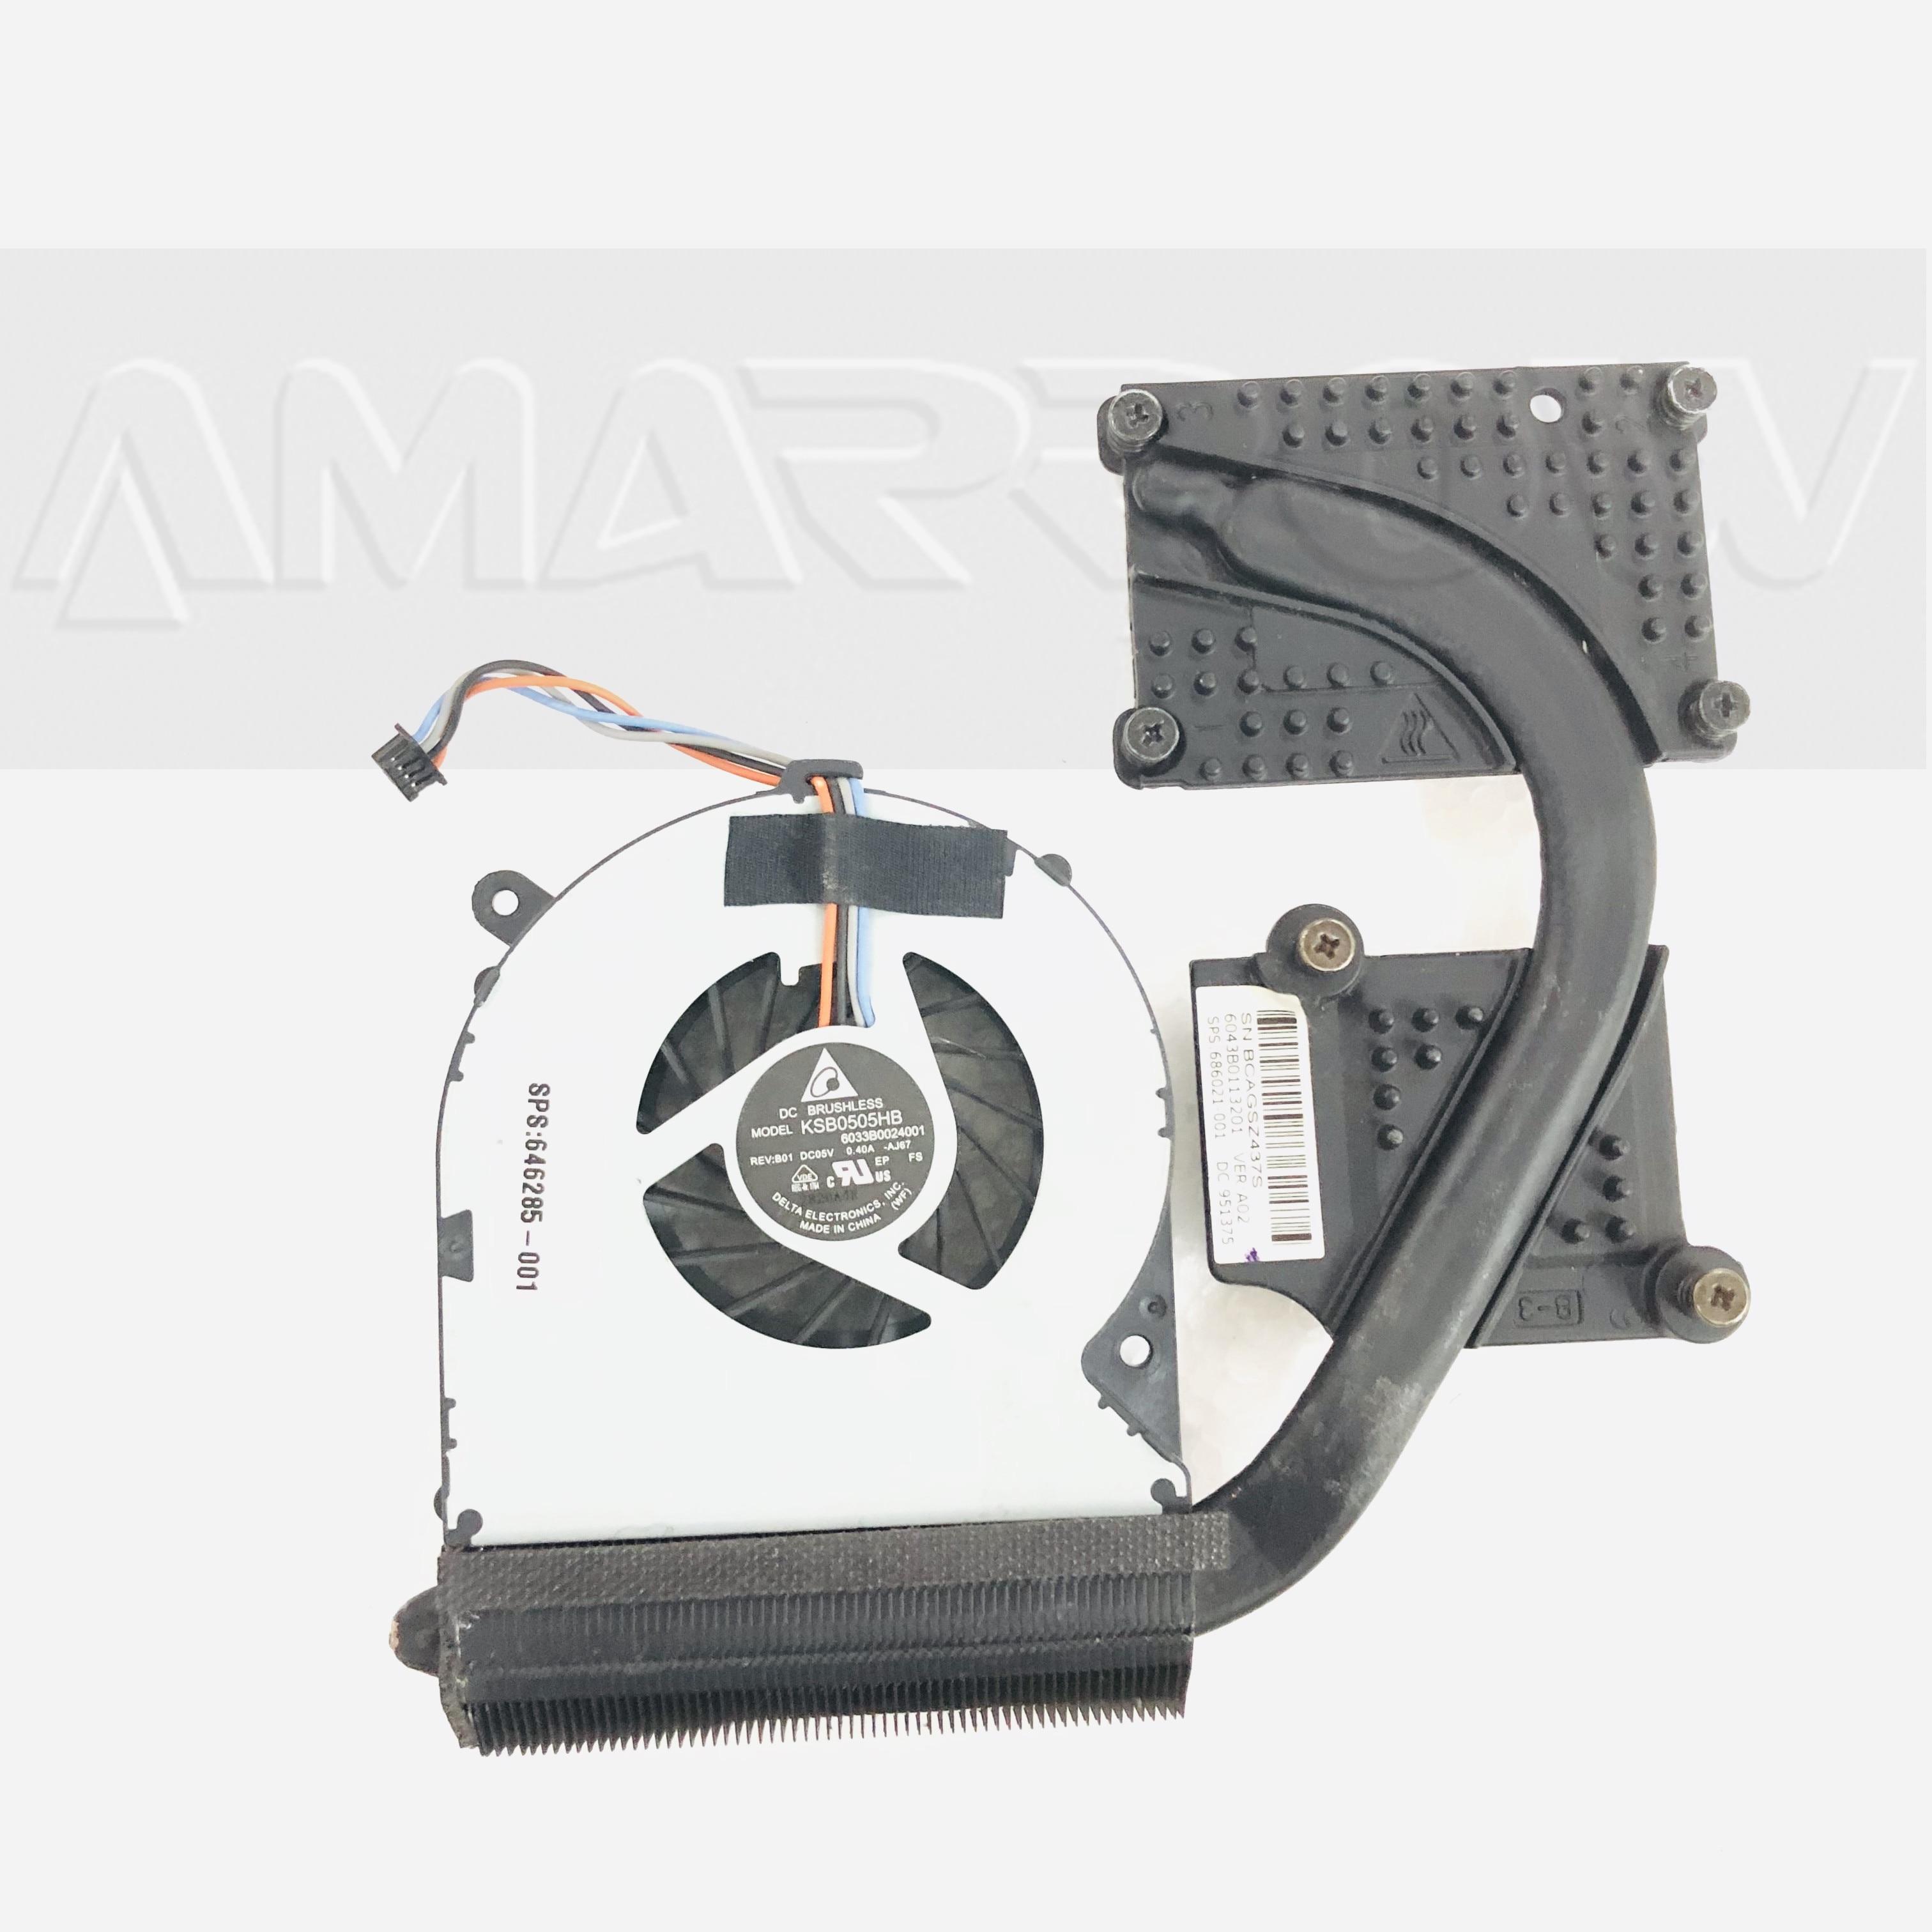 Original For HP Probook 8470p 6470b Cooling Heatsink With Fan 686021-001